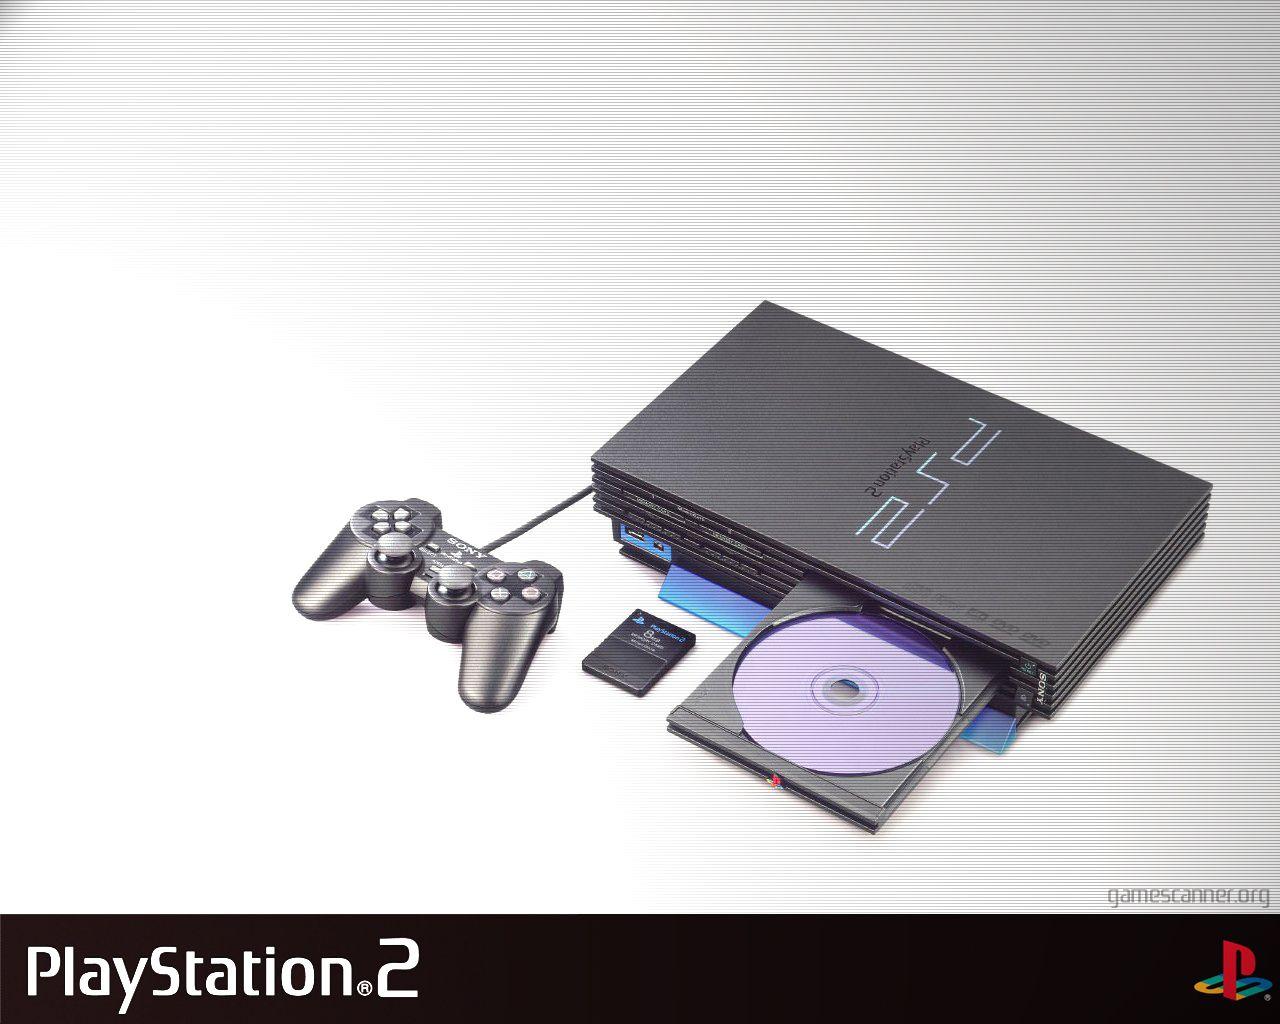 Download Playstation 2 wallpaper, 'Playstation 2 2'. http